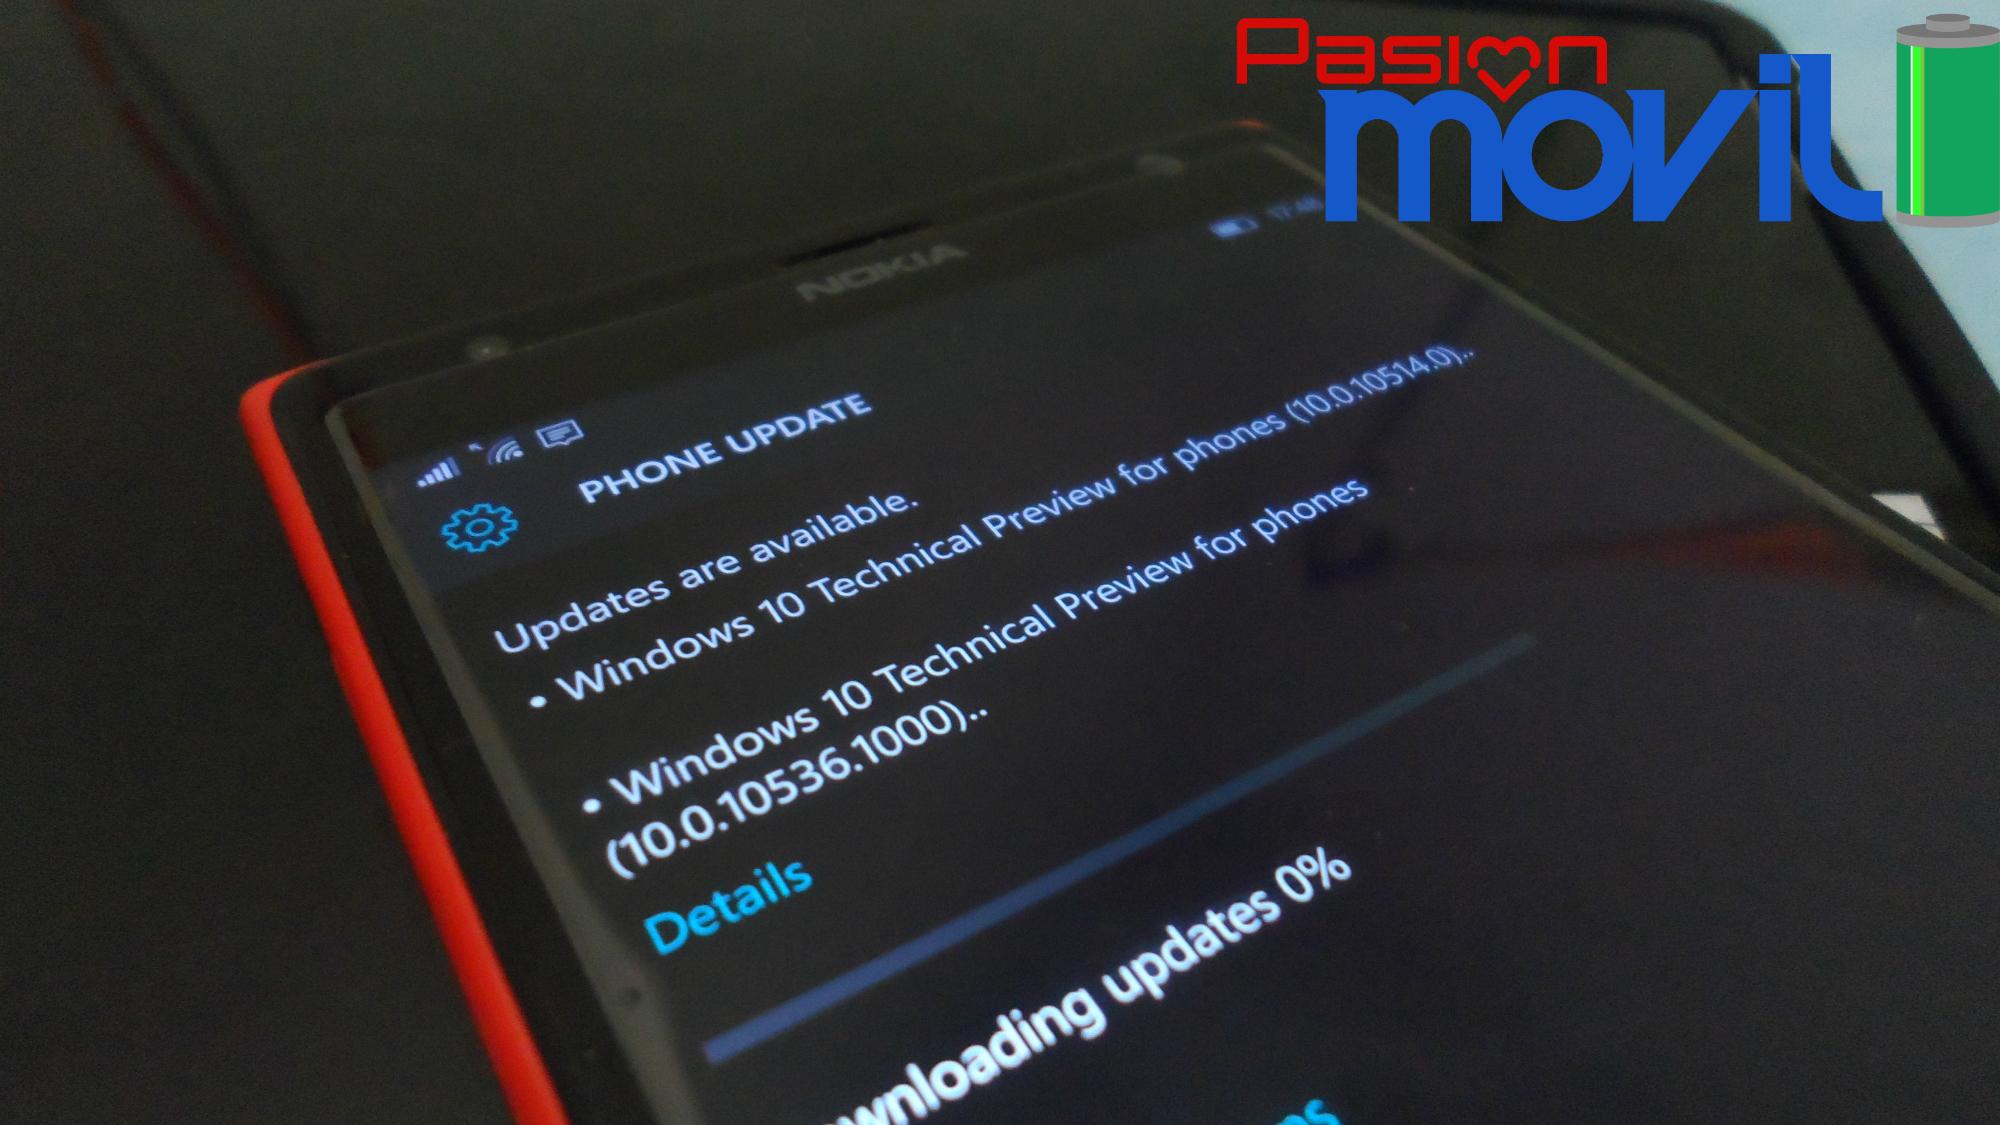 Windows 10 Mobile 10536 liberada